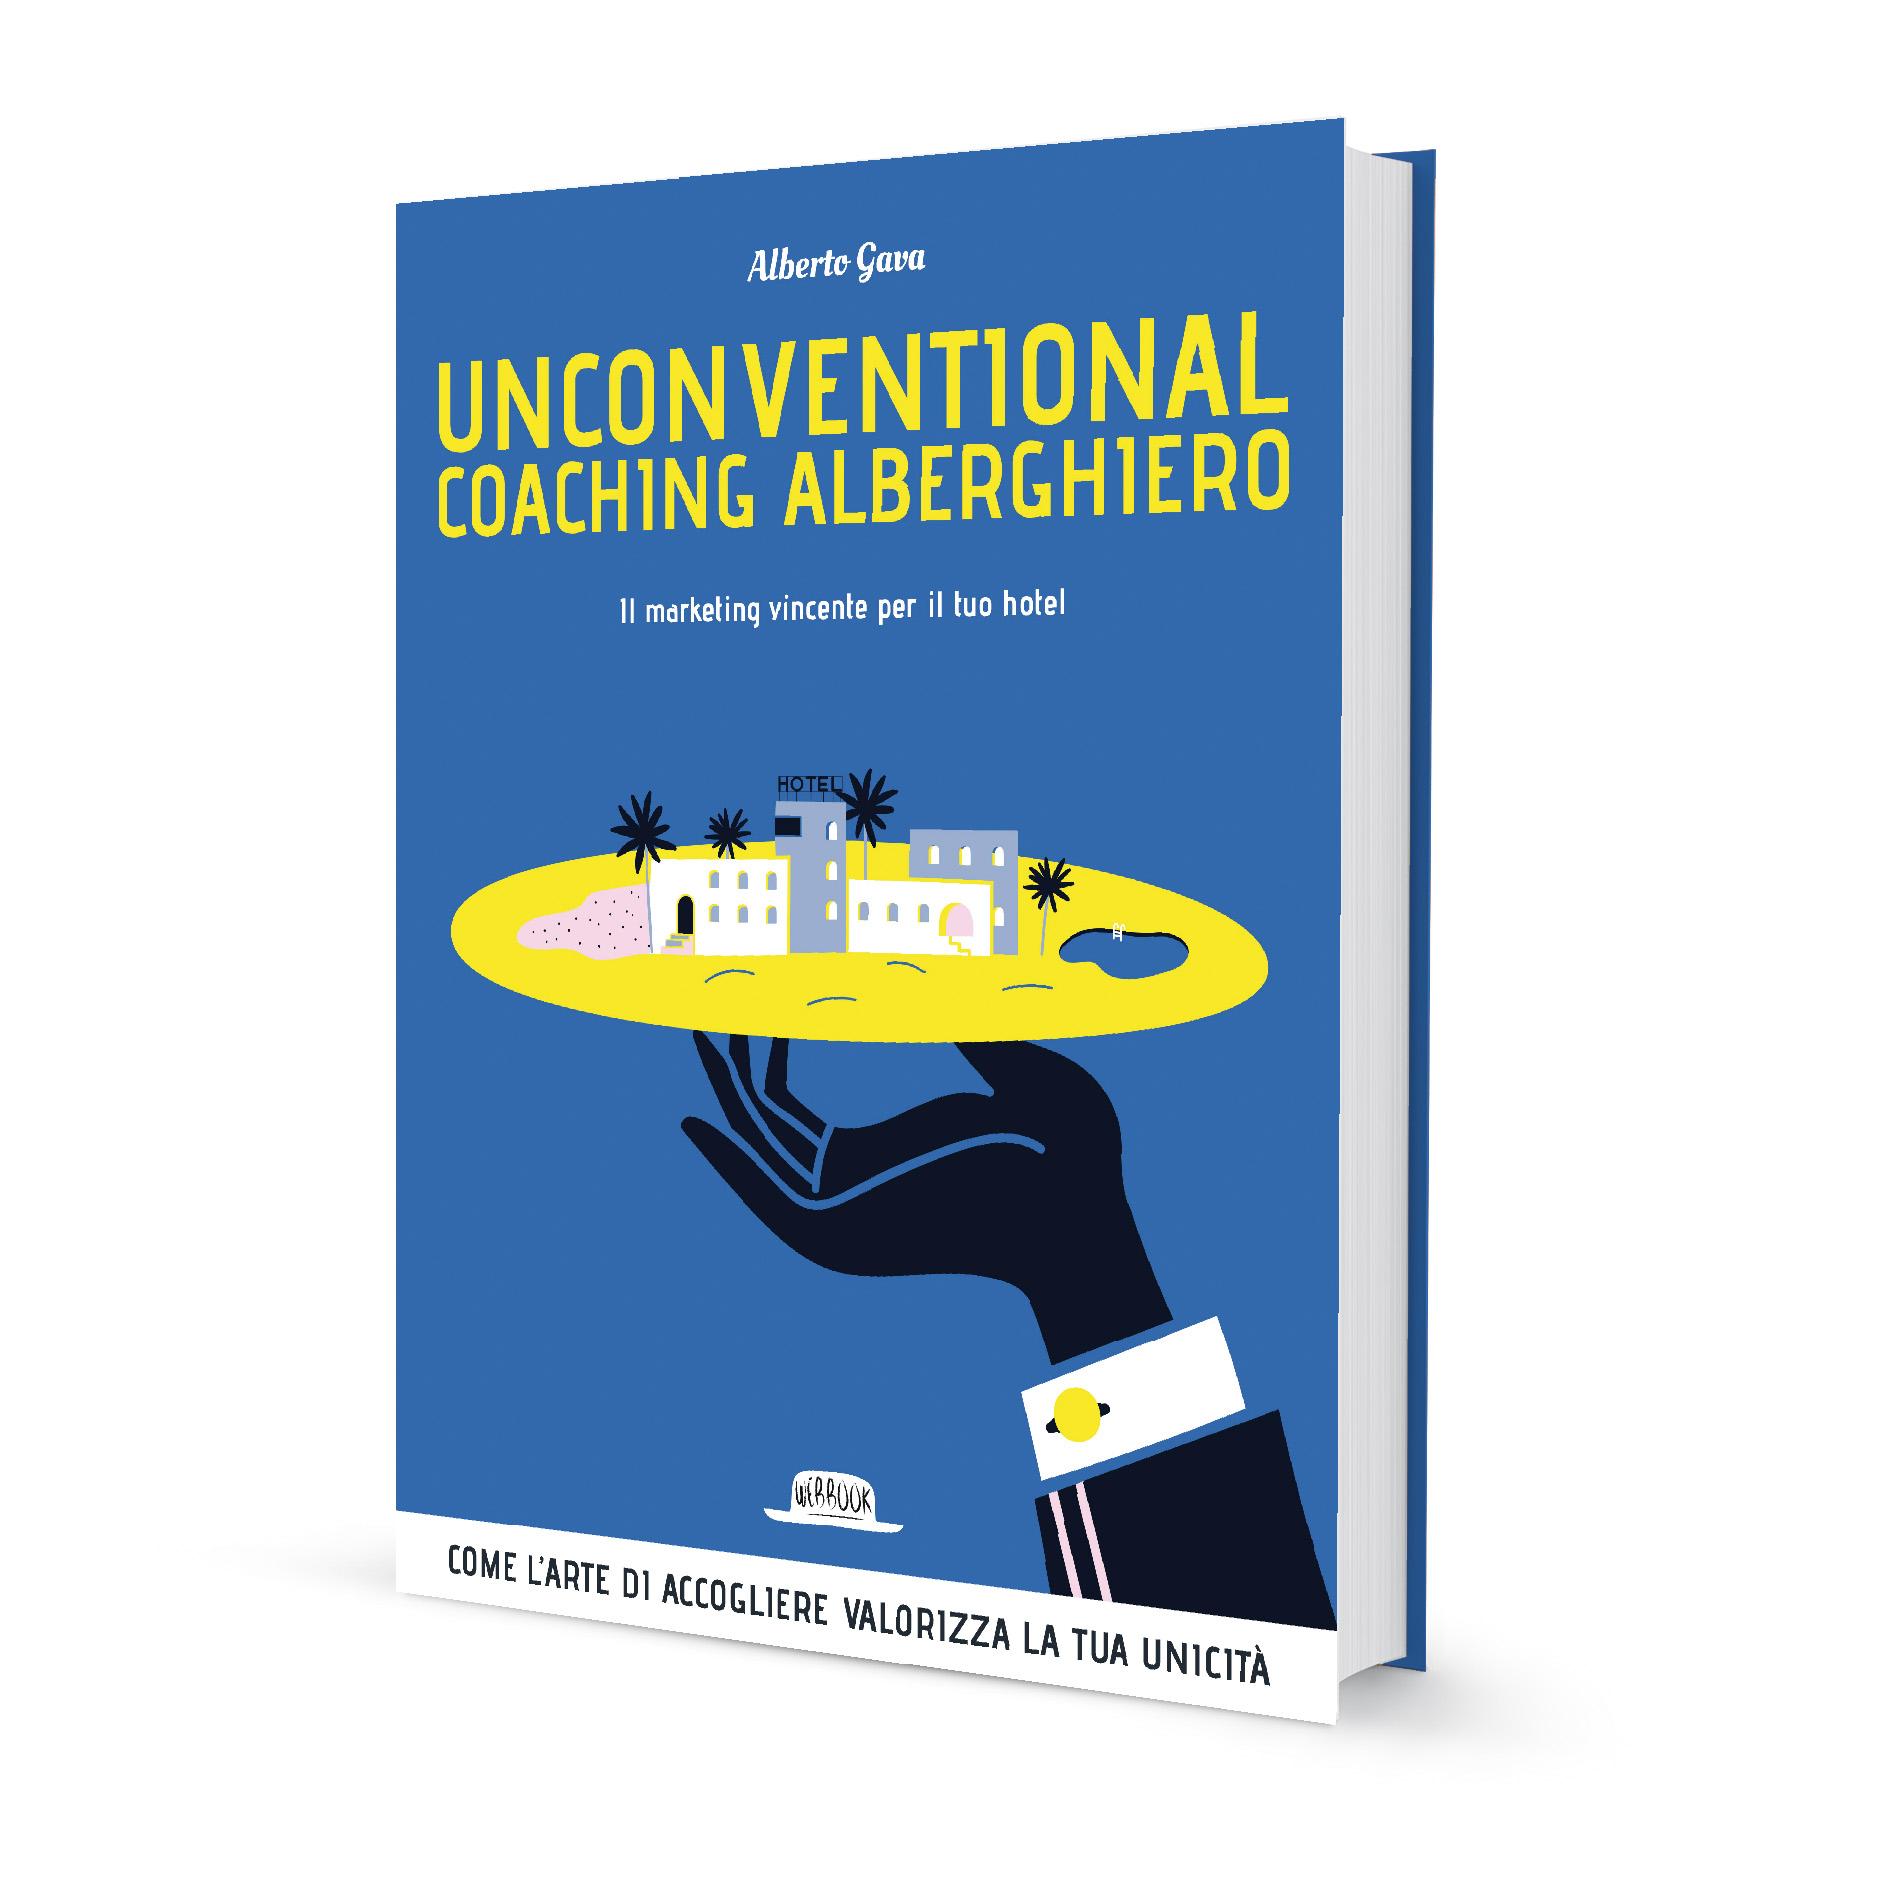 Unconventional coaching alberghiero